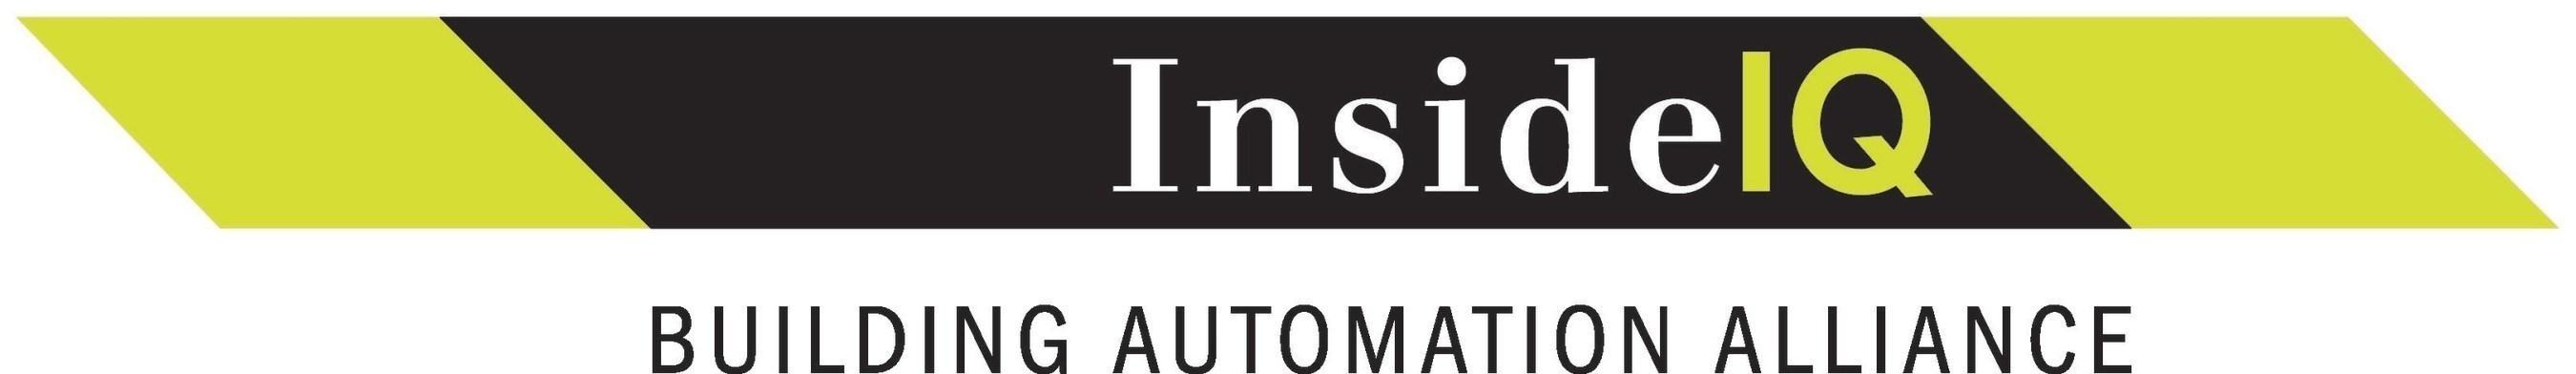 InsideIQ Building Automation Alliance Logo.